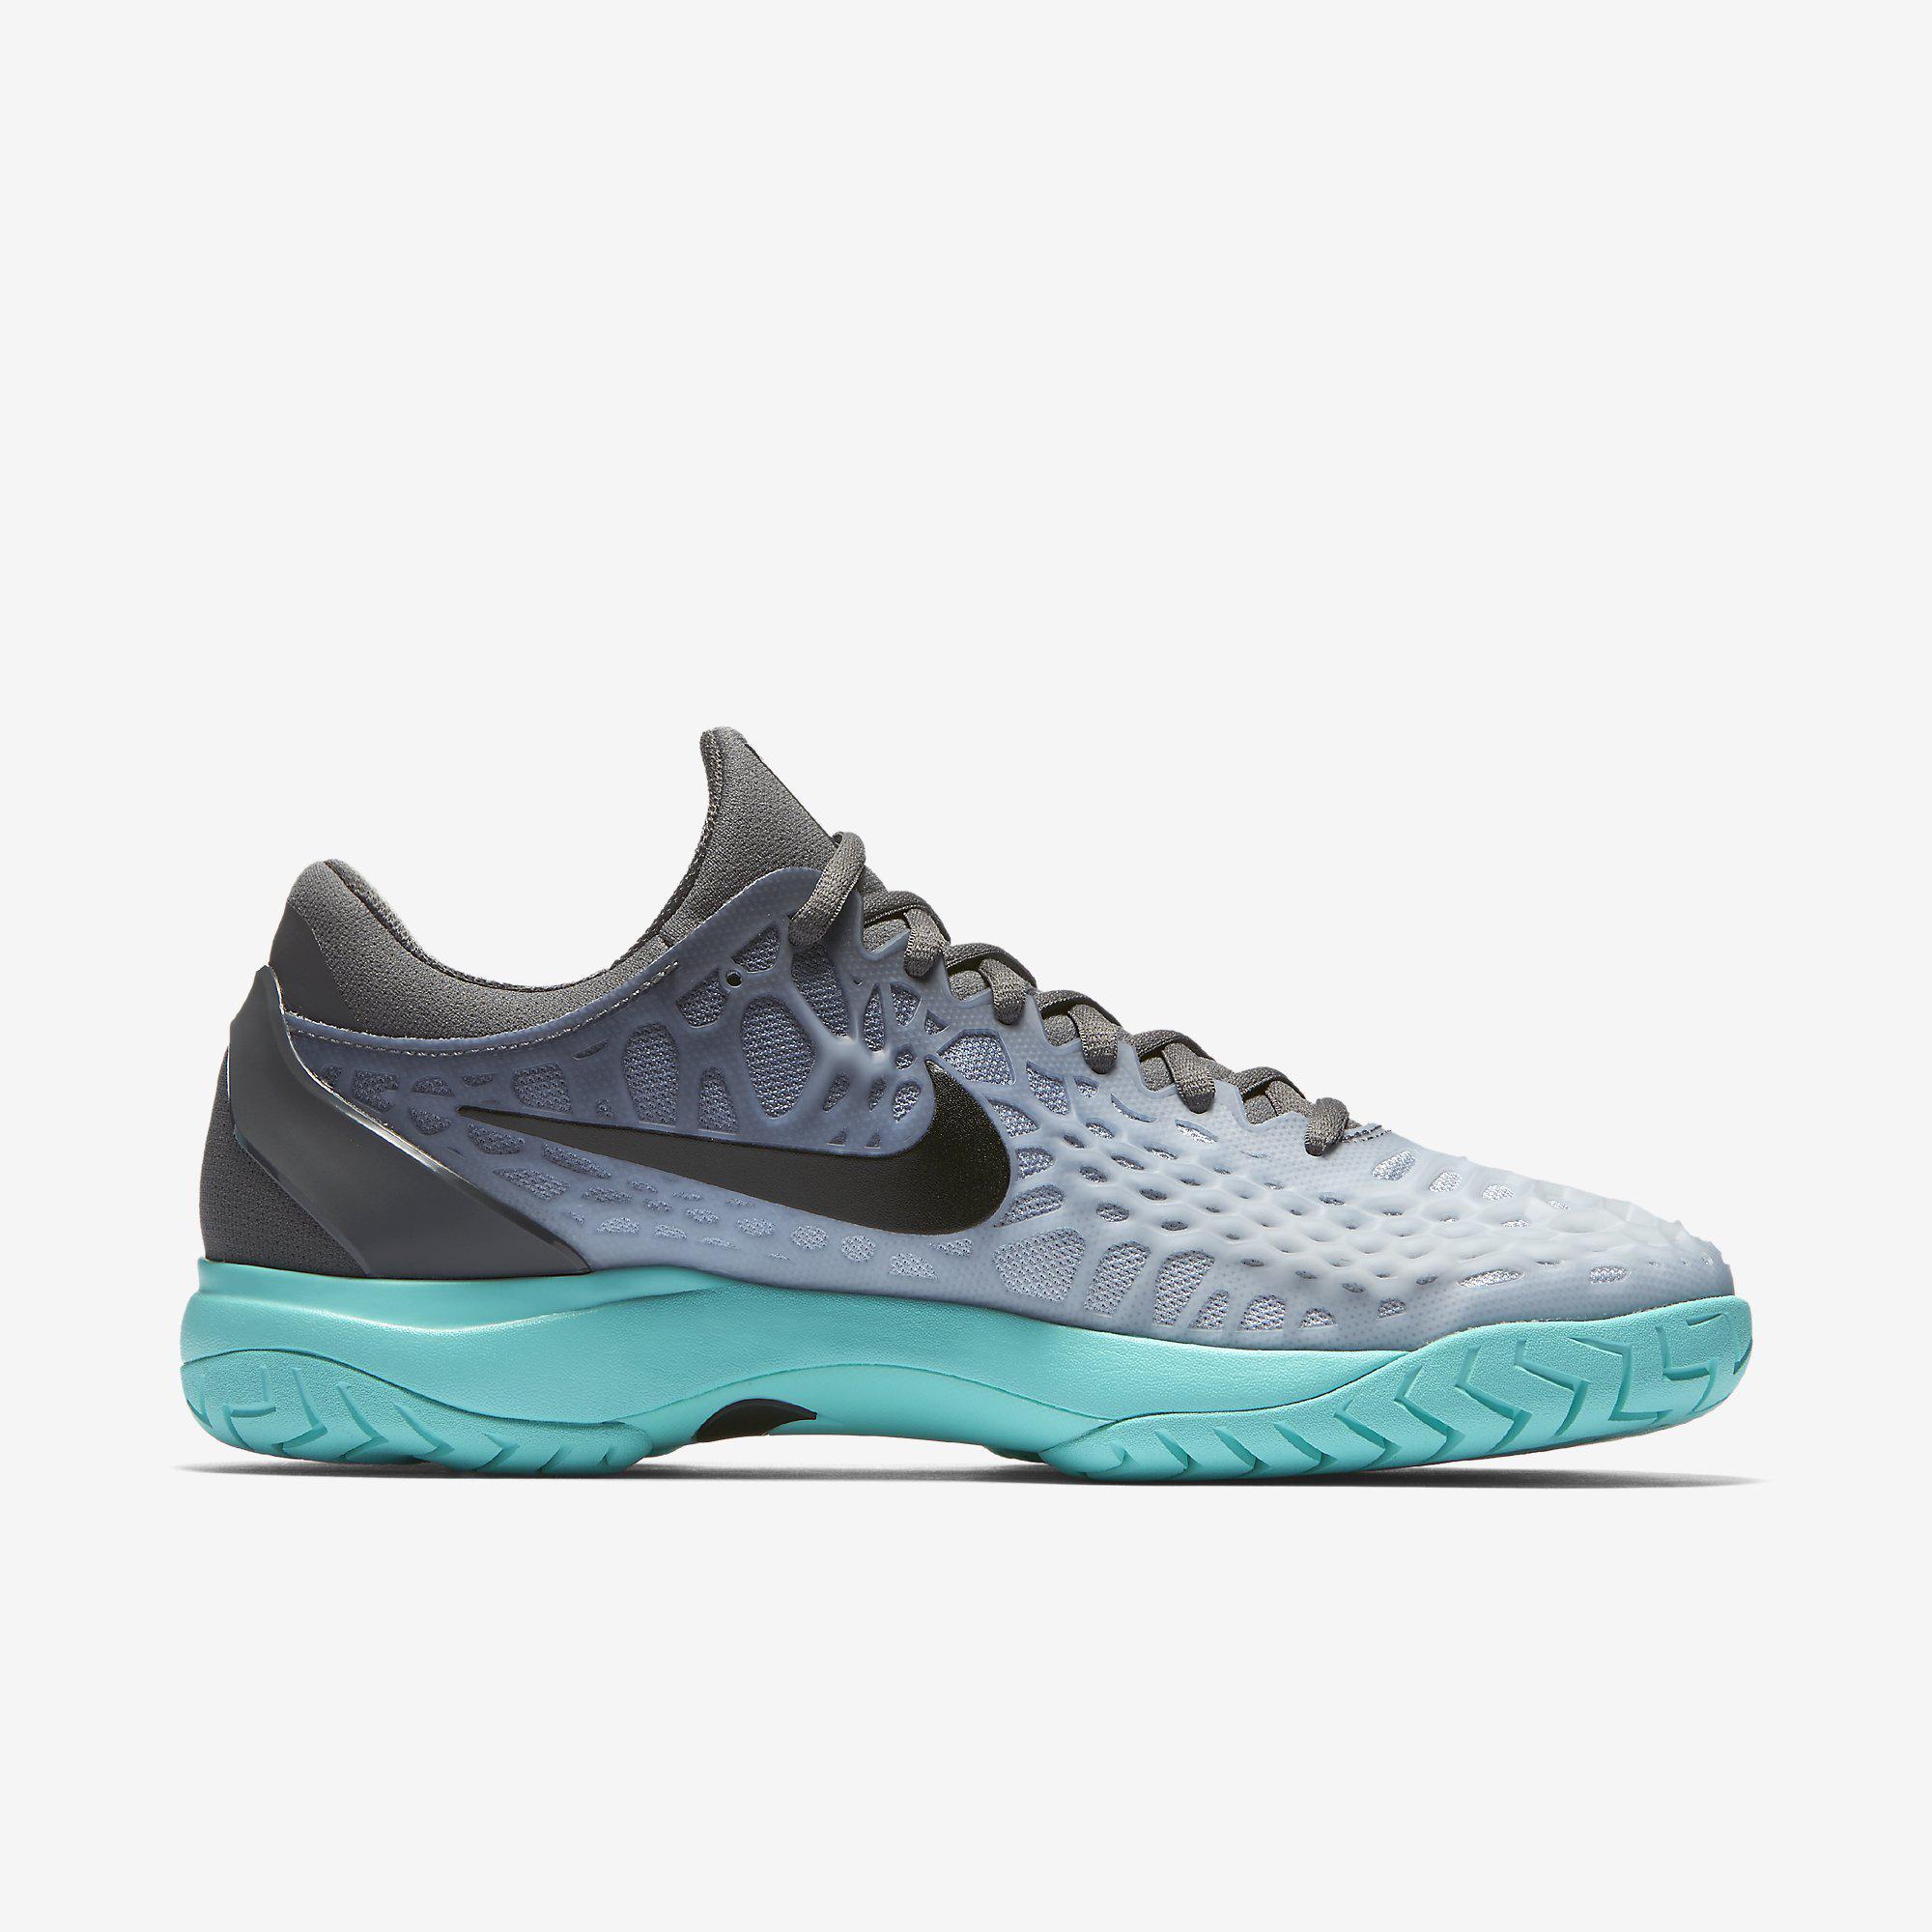 2d0def249b5 Nike Mens Zoom Cage 3 Tennis Shoes - Wolf Grey Aurora